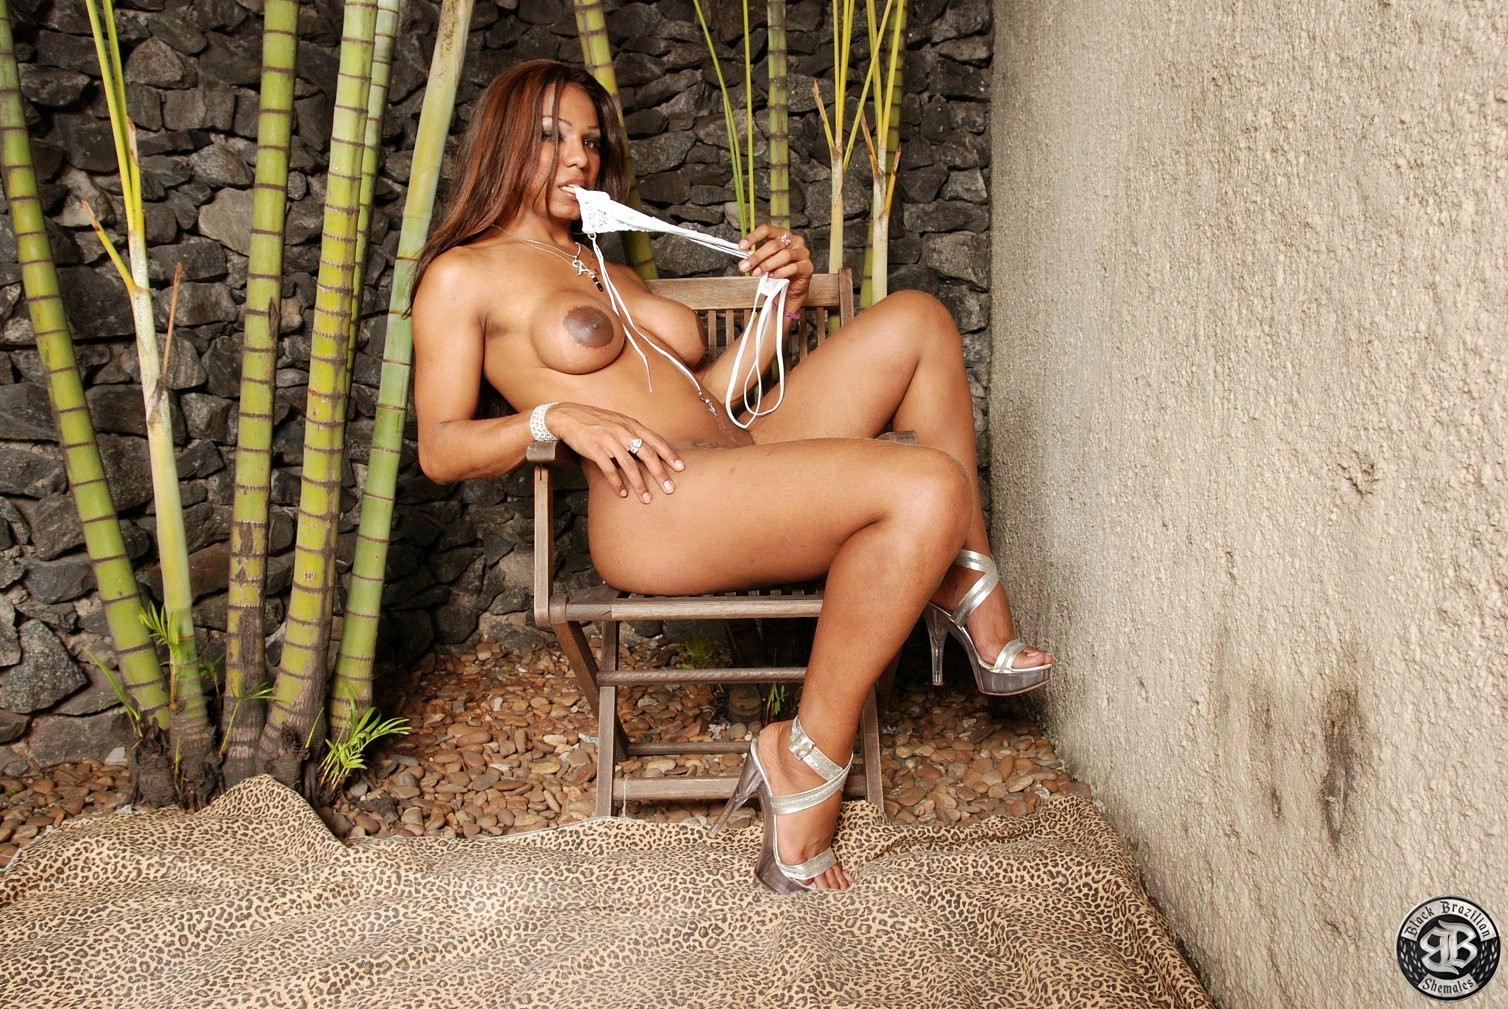 Adorable Tgirl Andreza Stroking Her Juicy Tool